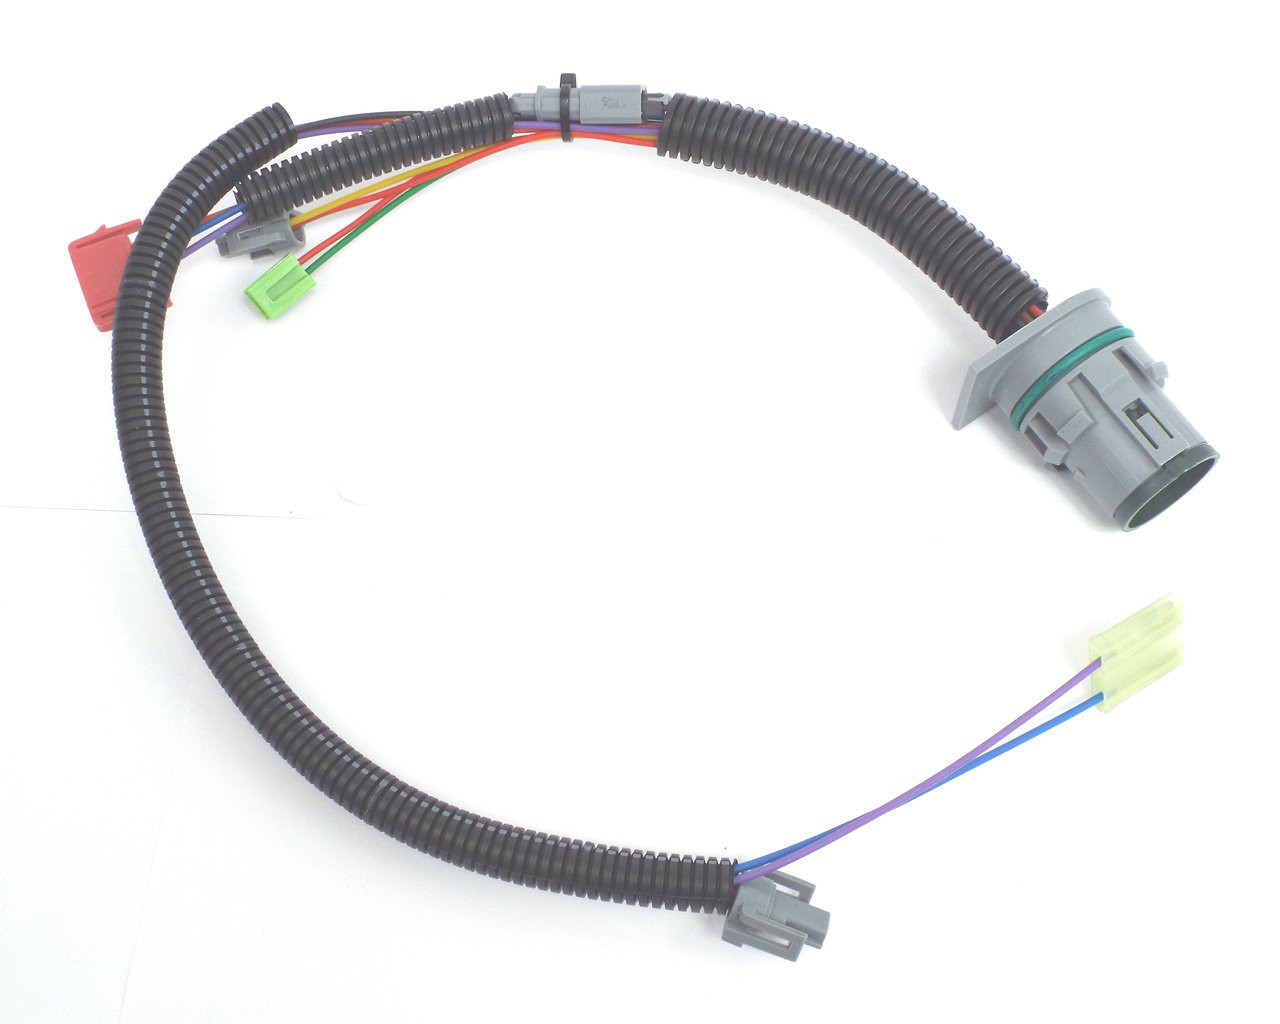 hight resolution of new 4l80e transmission hd internal valve body wiring harness 1991 2003 4l80e wiring harness